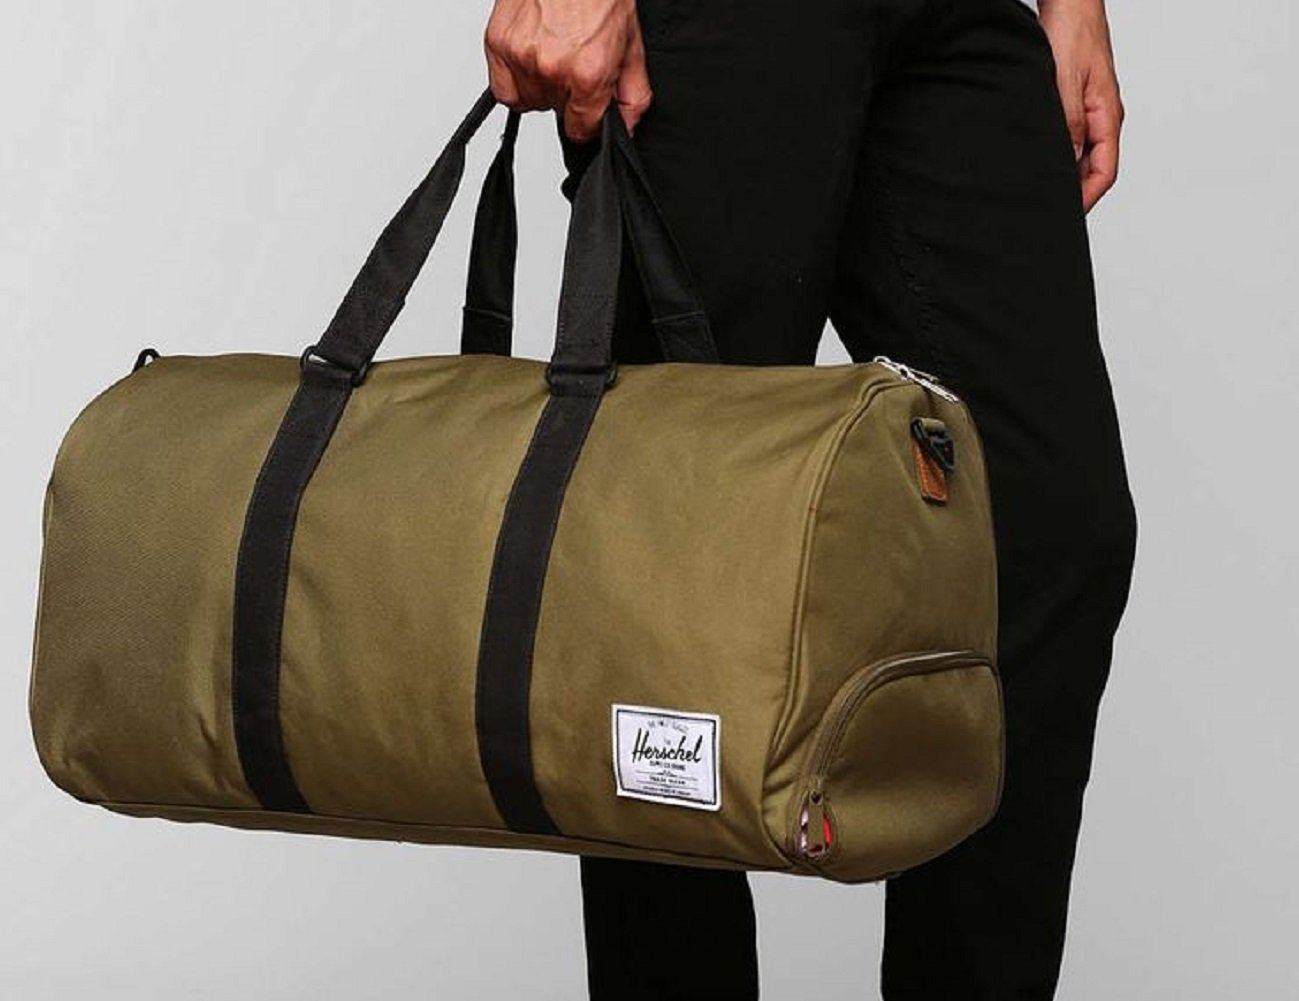 herschel supply co. sutton nailhead duffel bag